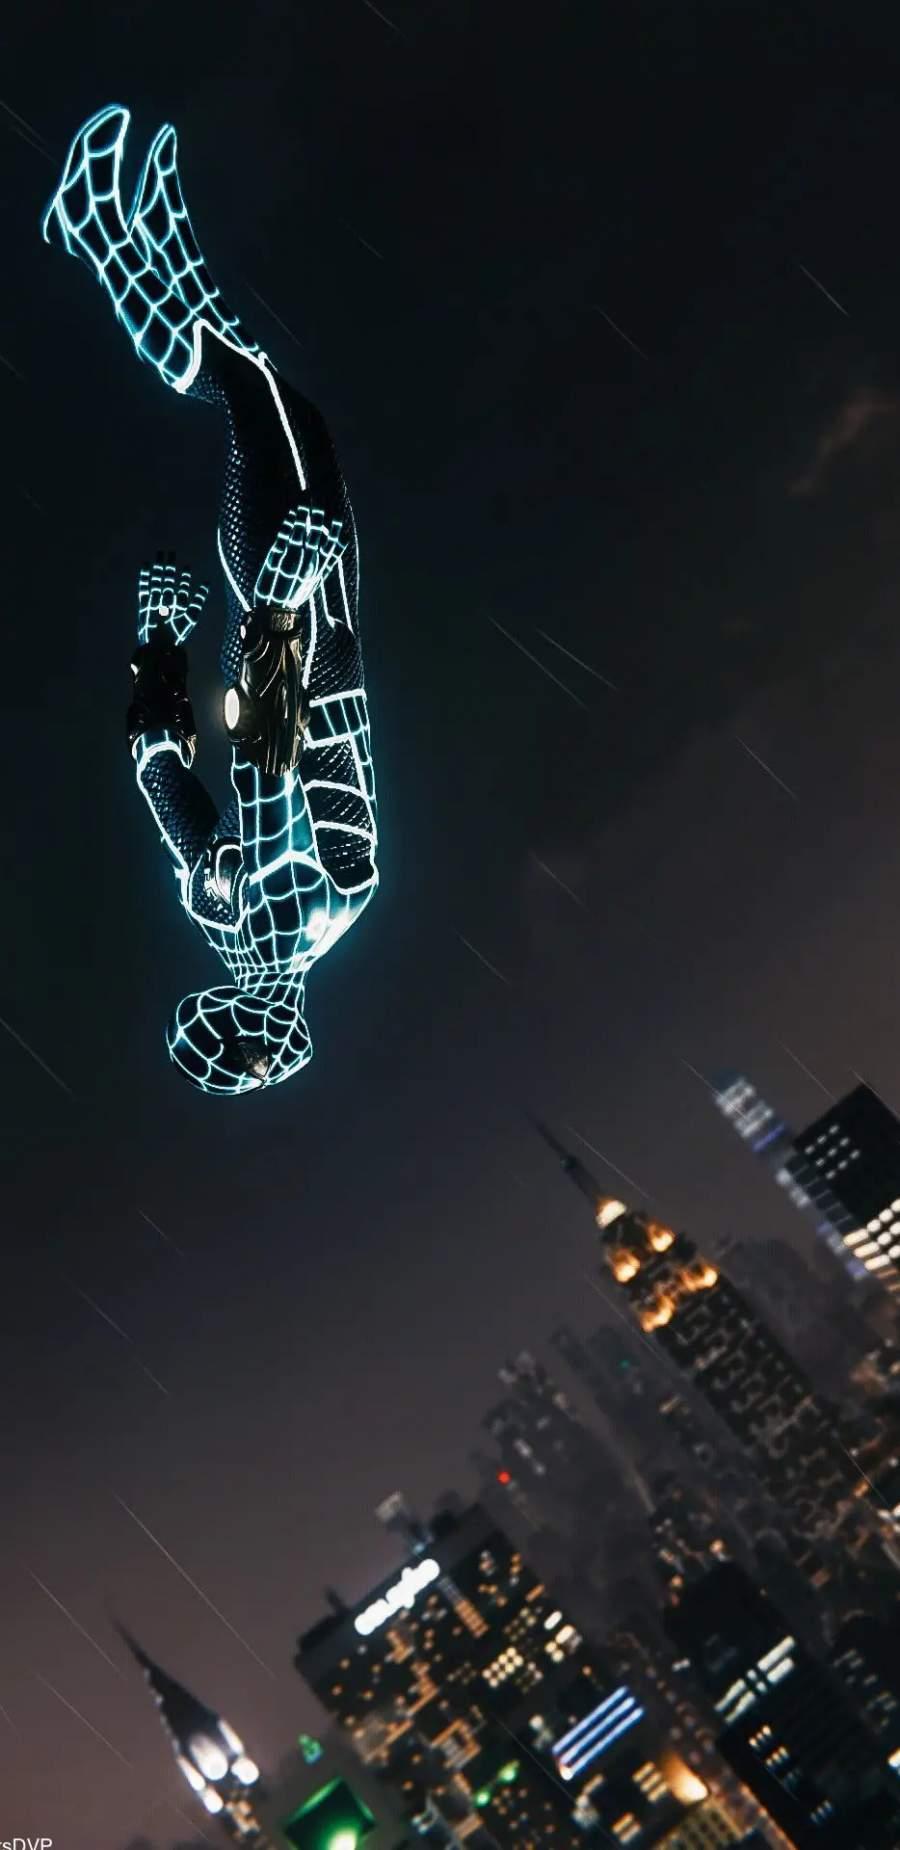 Spider Man Neon iPhone Wallpaper